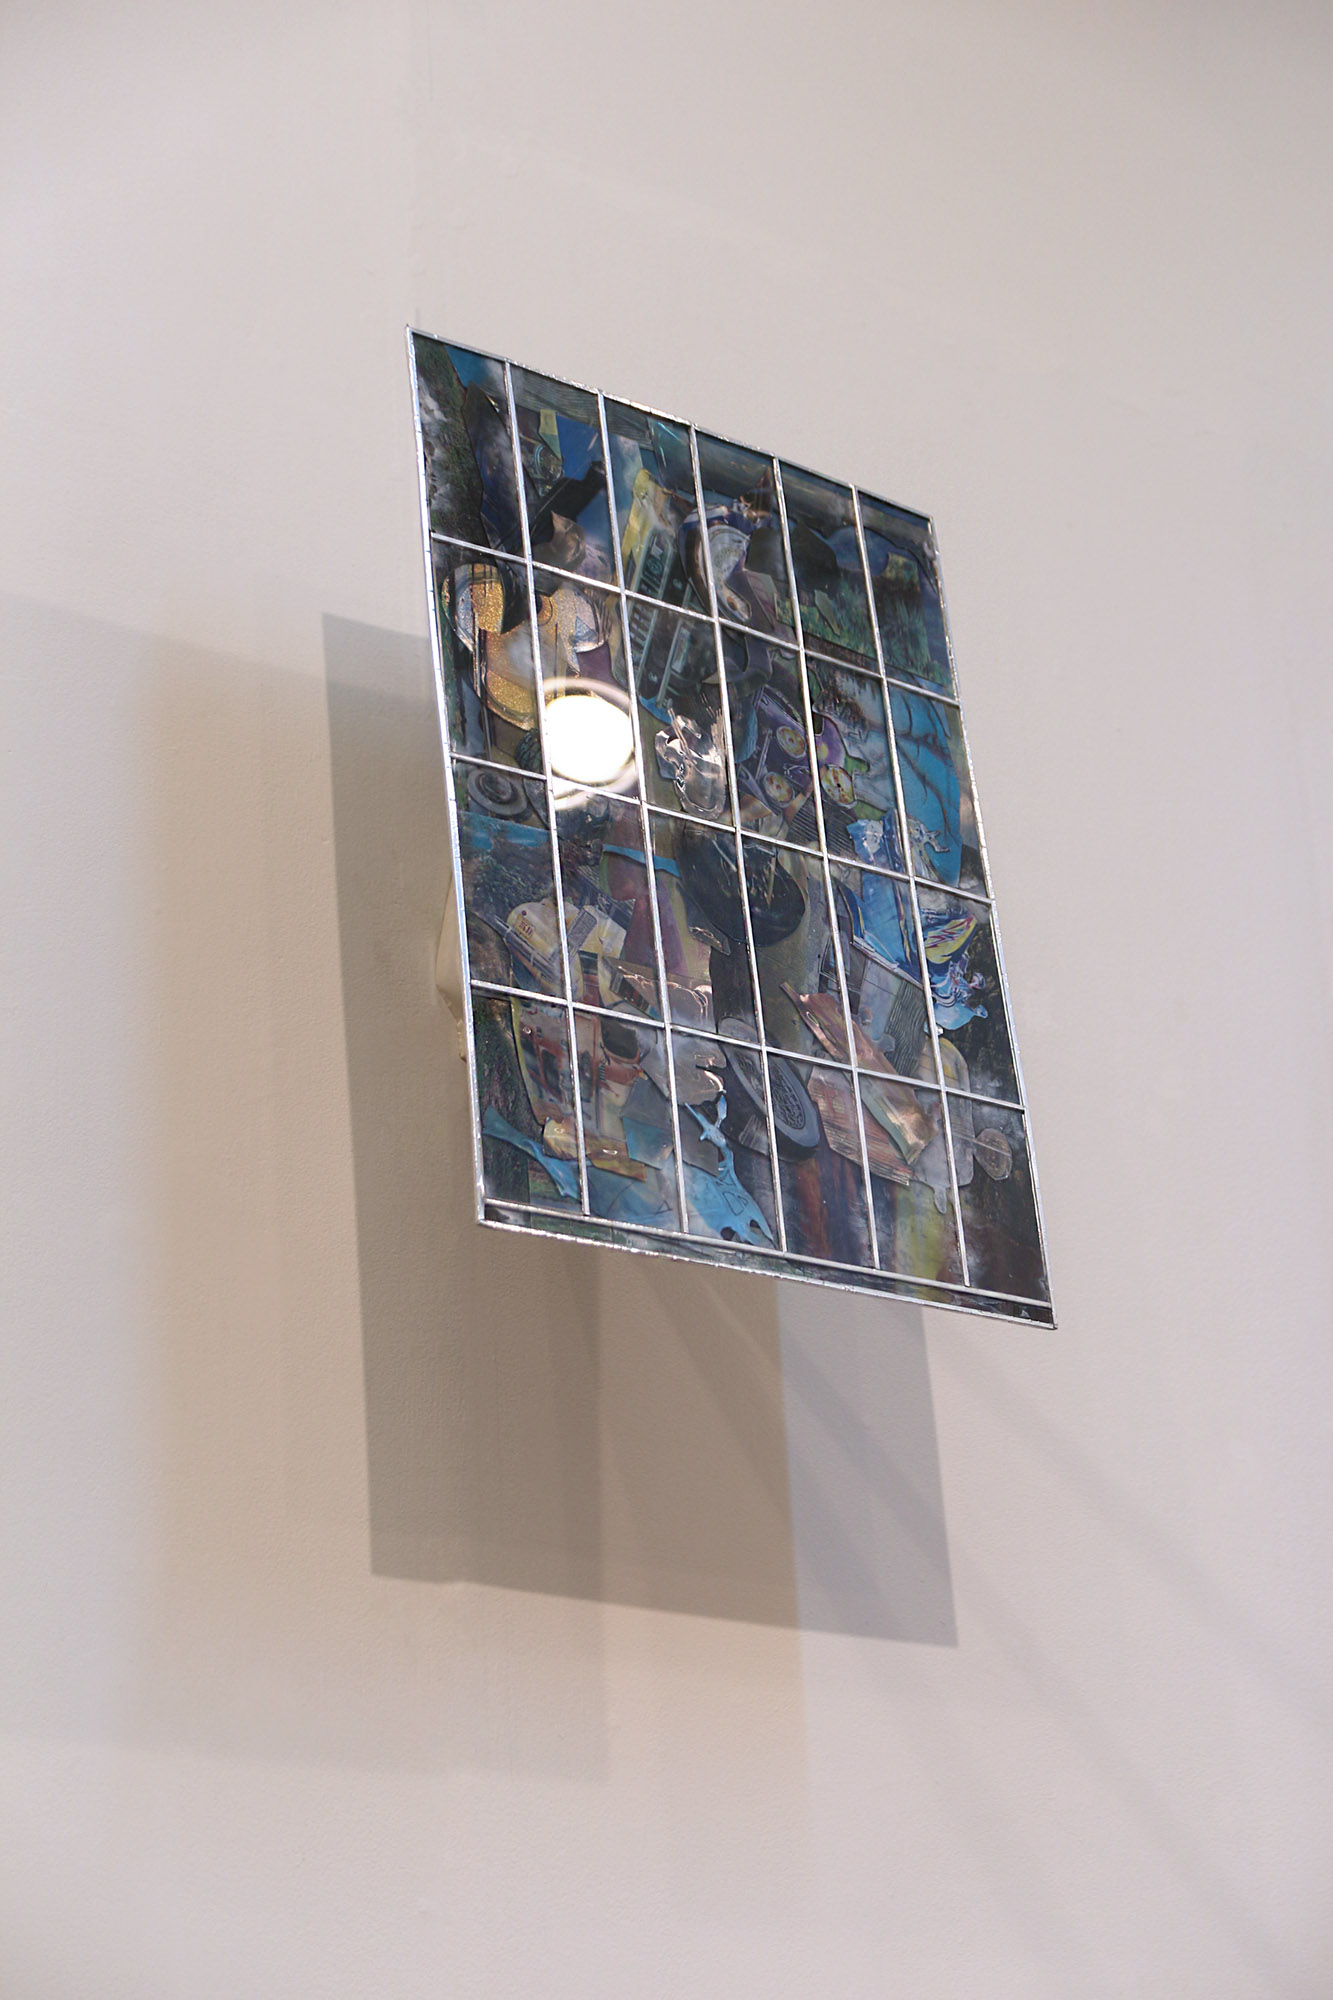 solarpanel_1_small.jpg